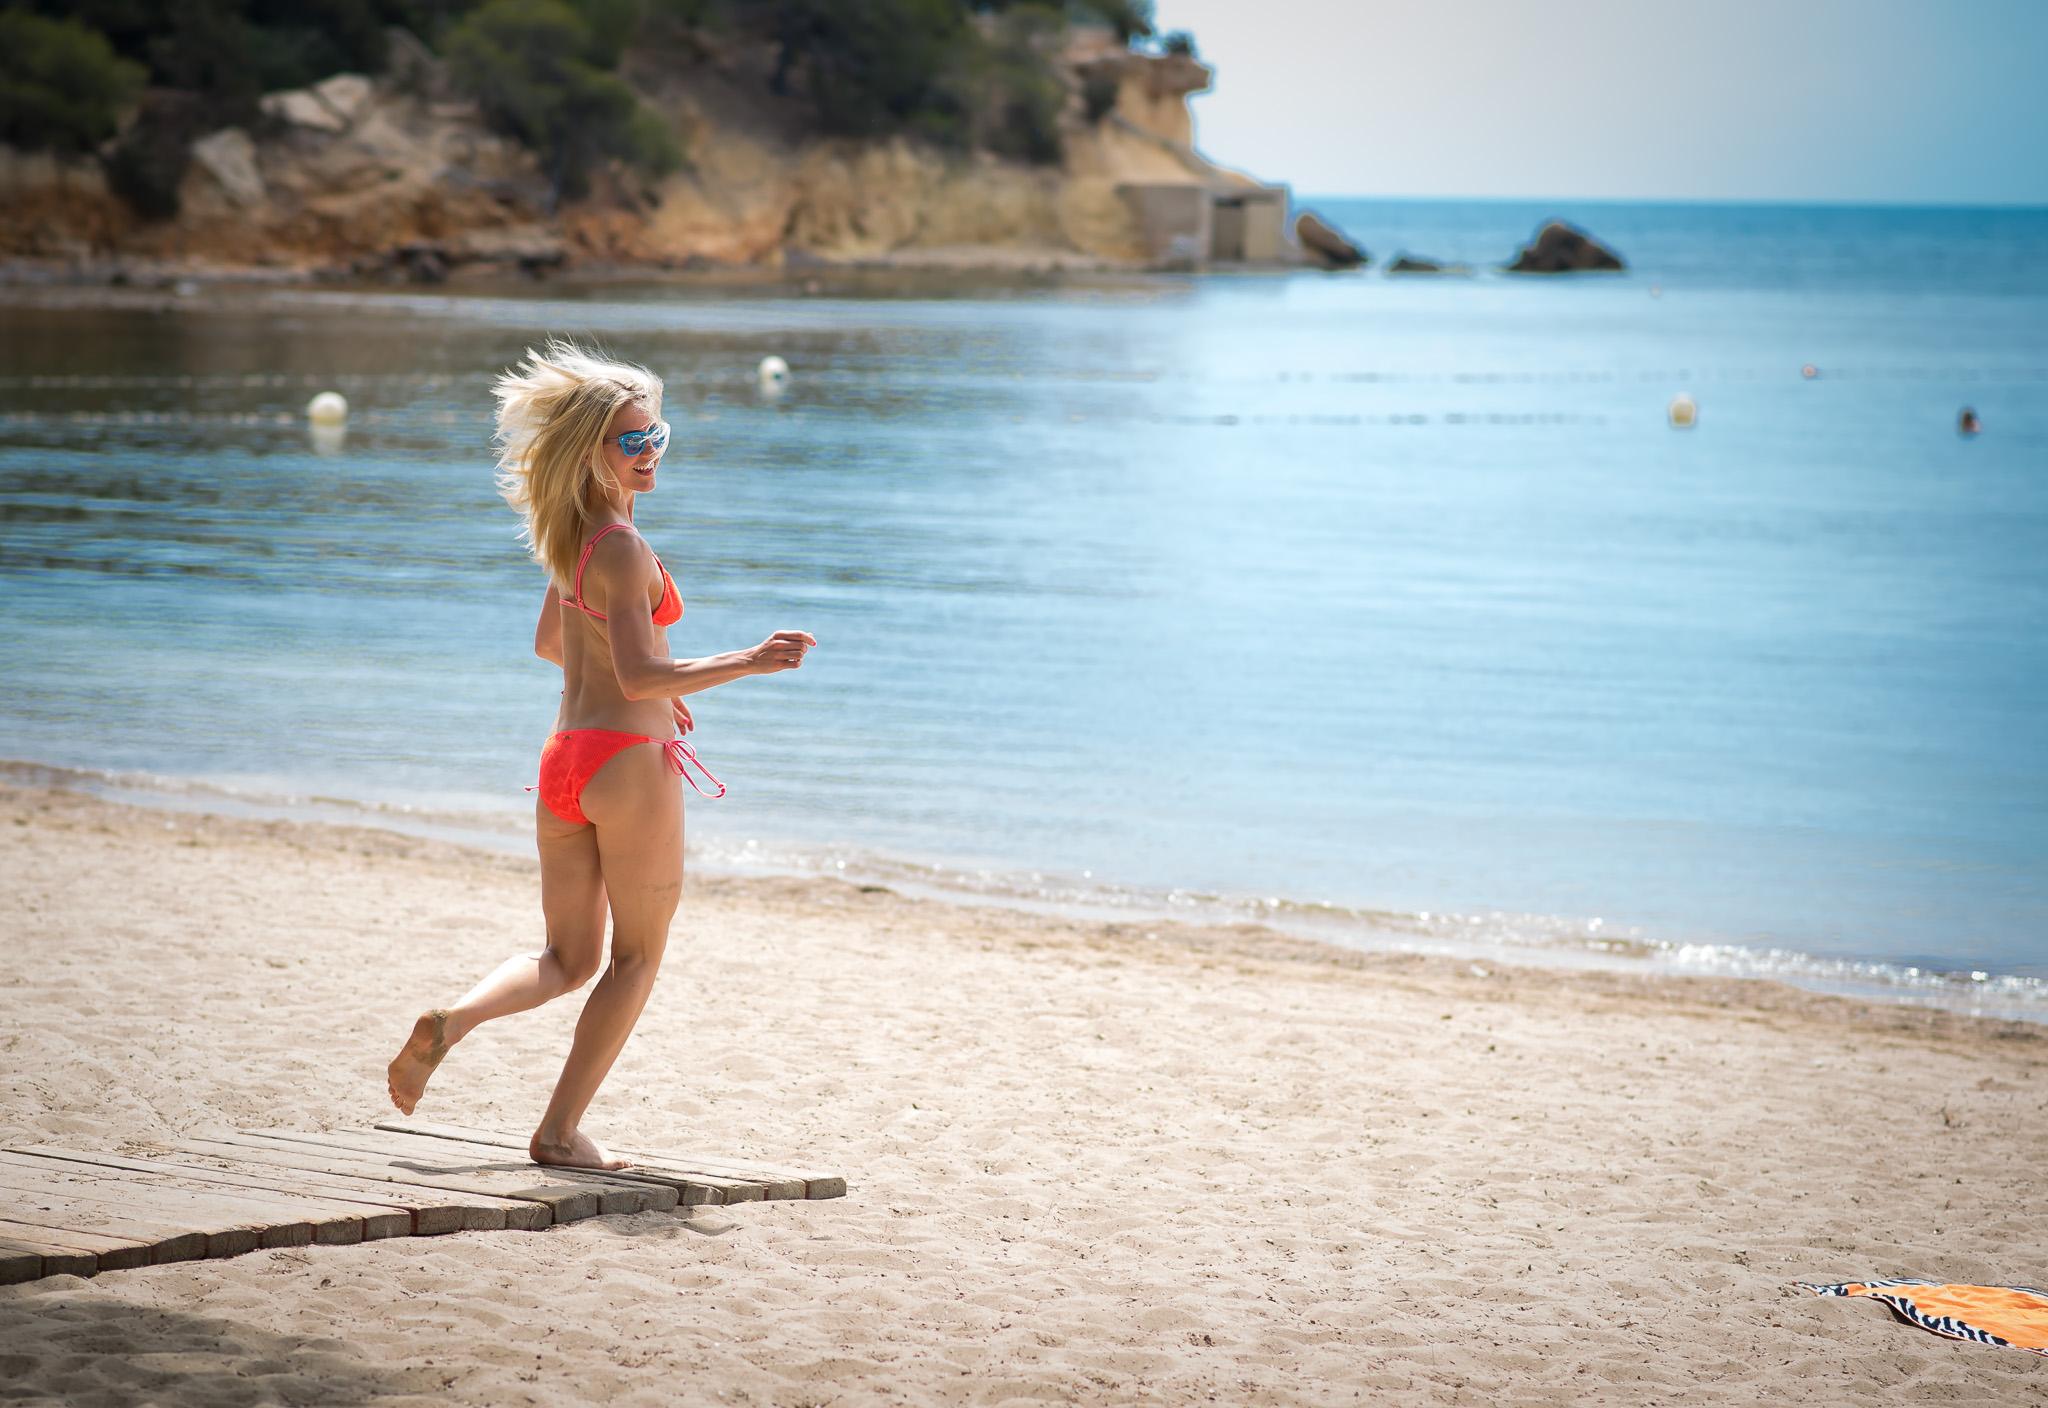 Ibiza Beachlife juni 2016-3 - Annika Something